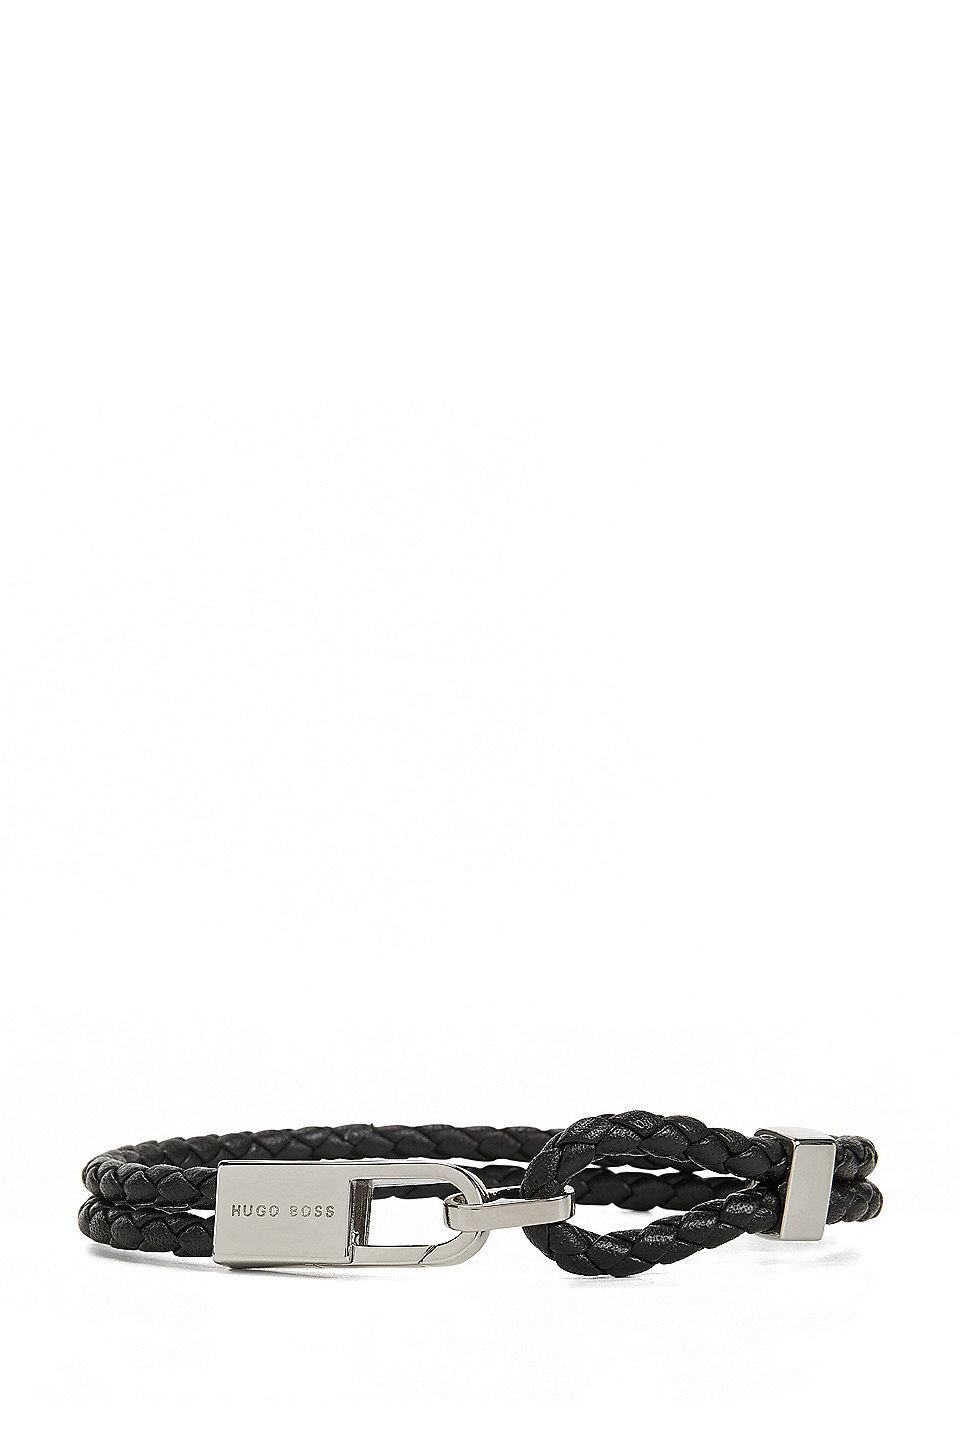 Boss Braided Leather Bracelet Bryan